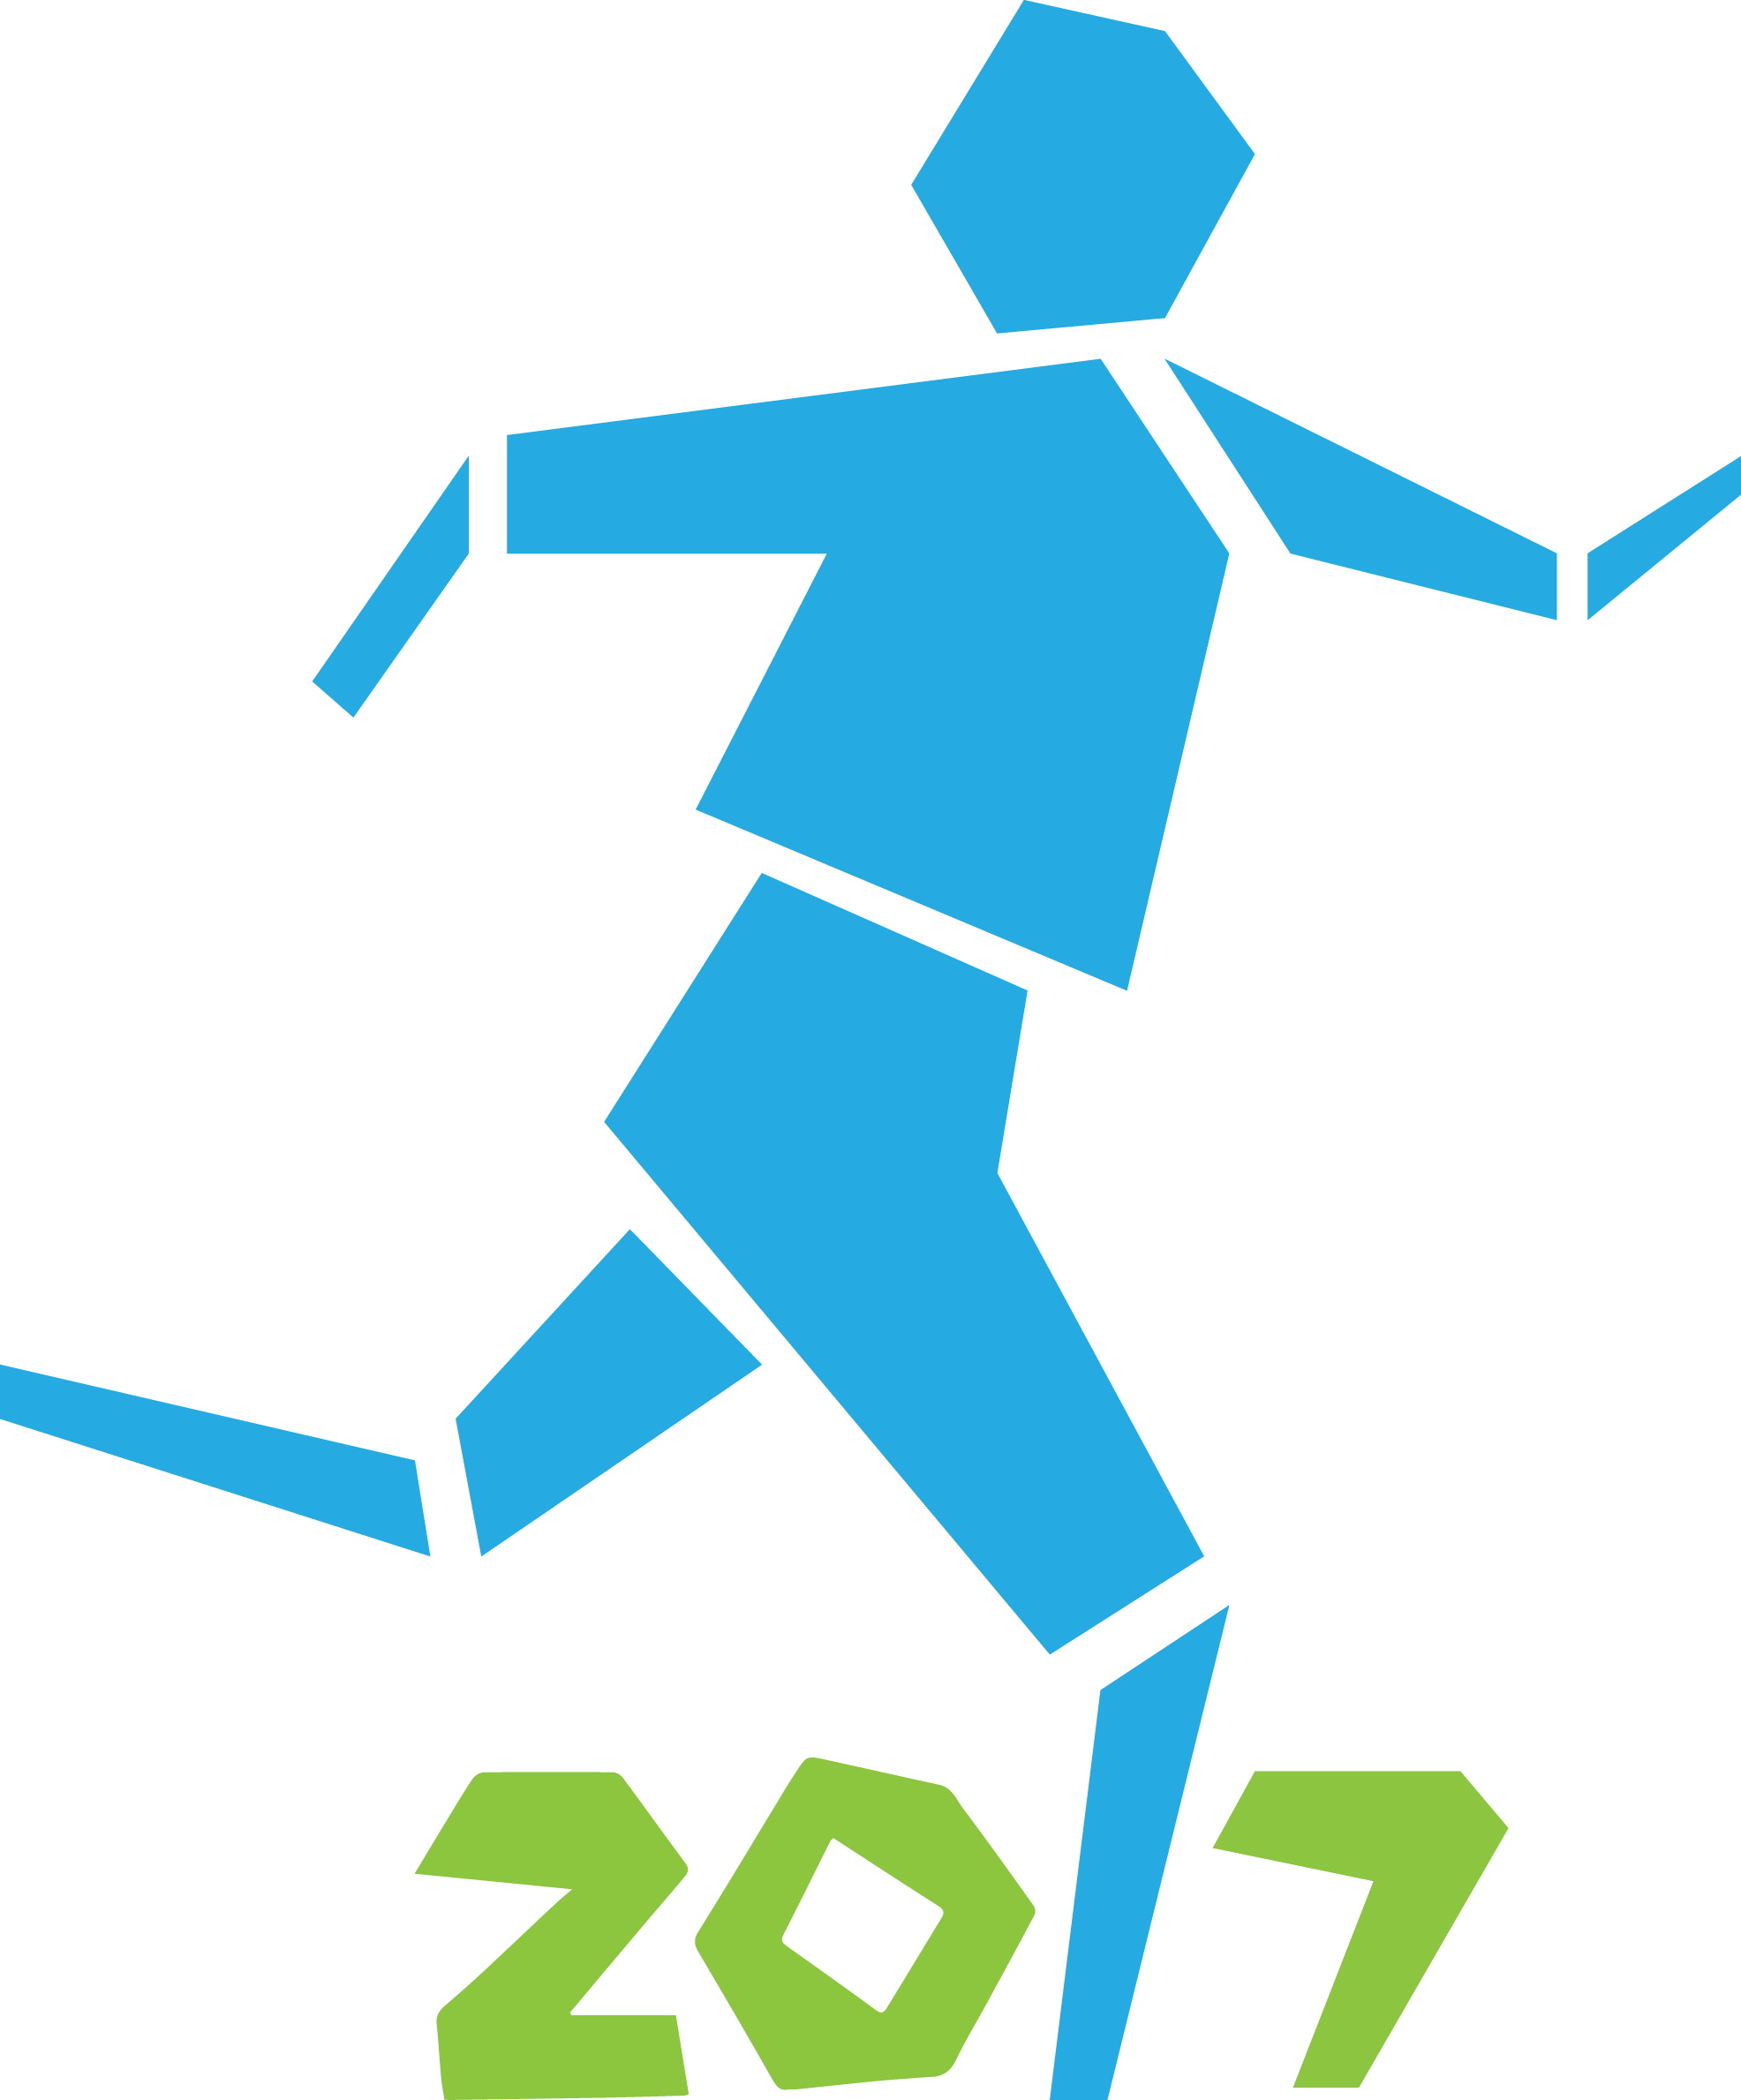 Campusrun 2017